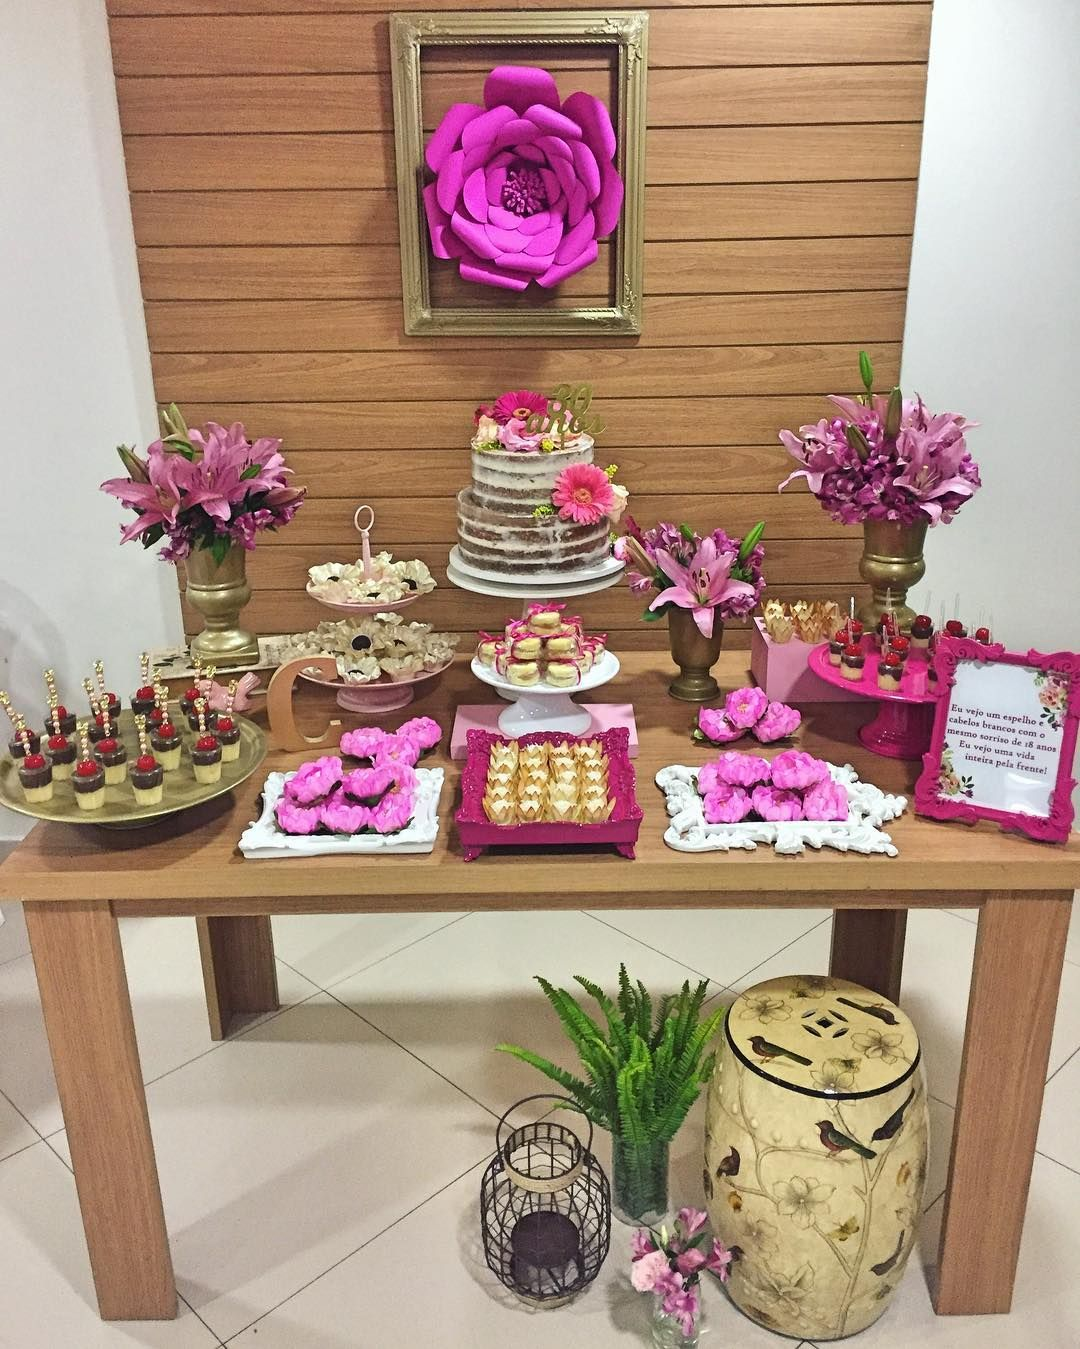 Festa Adulto Feminina 30 Anos Simples E Delicada Em Tons De Rosa